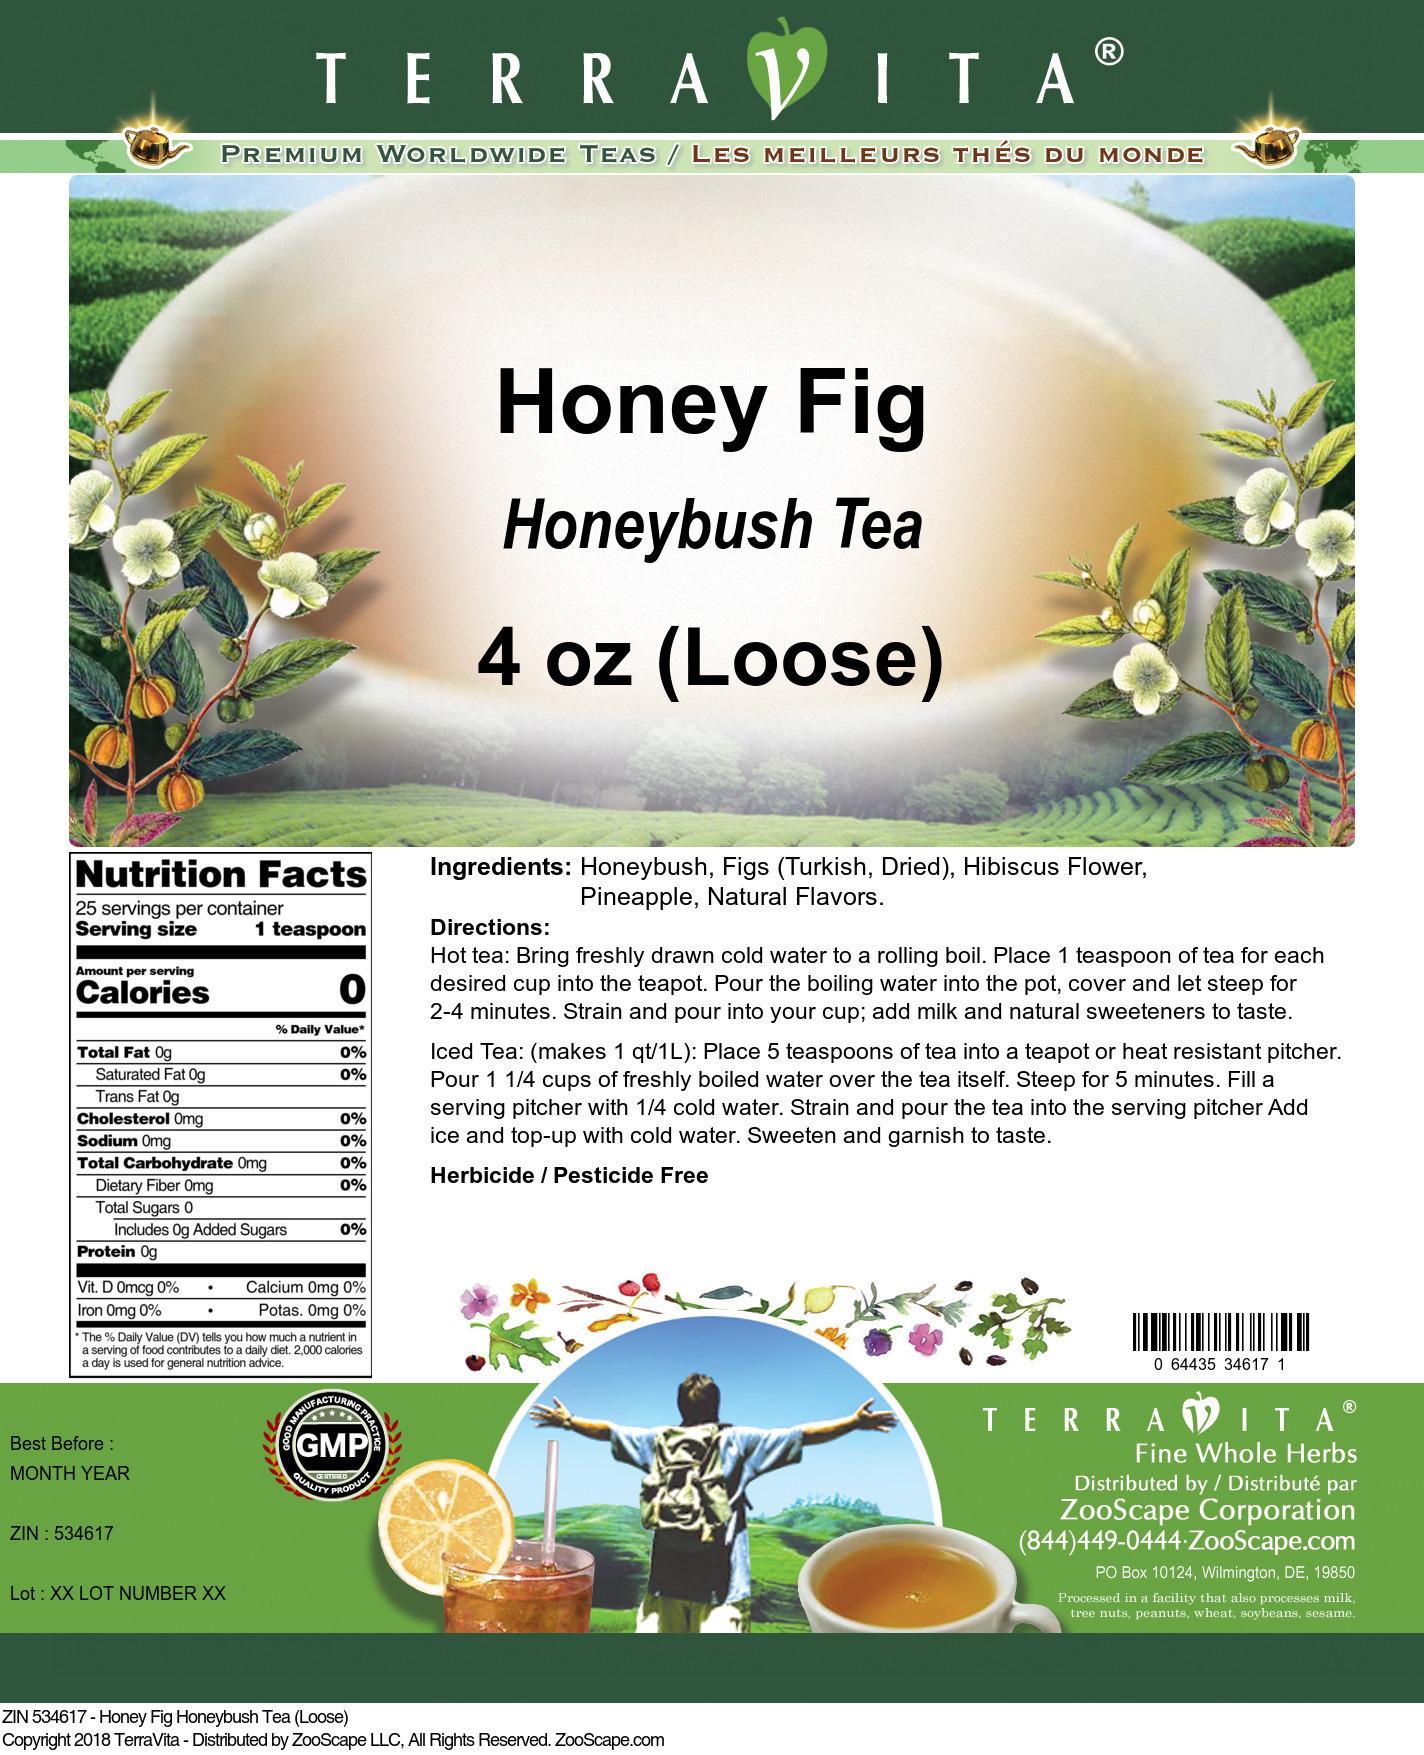 Honey Fig Honeybush Tea (Loose)